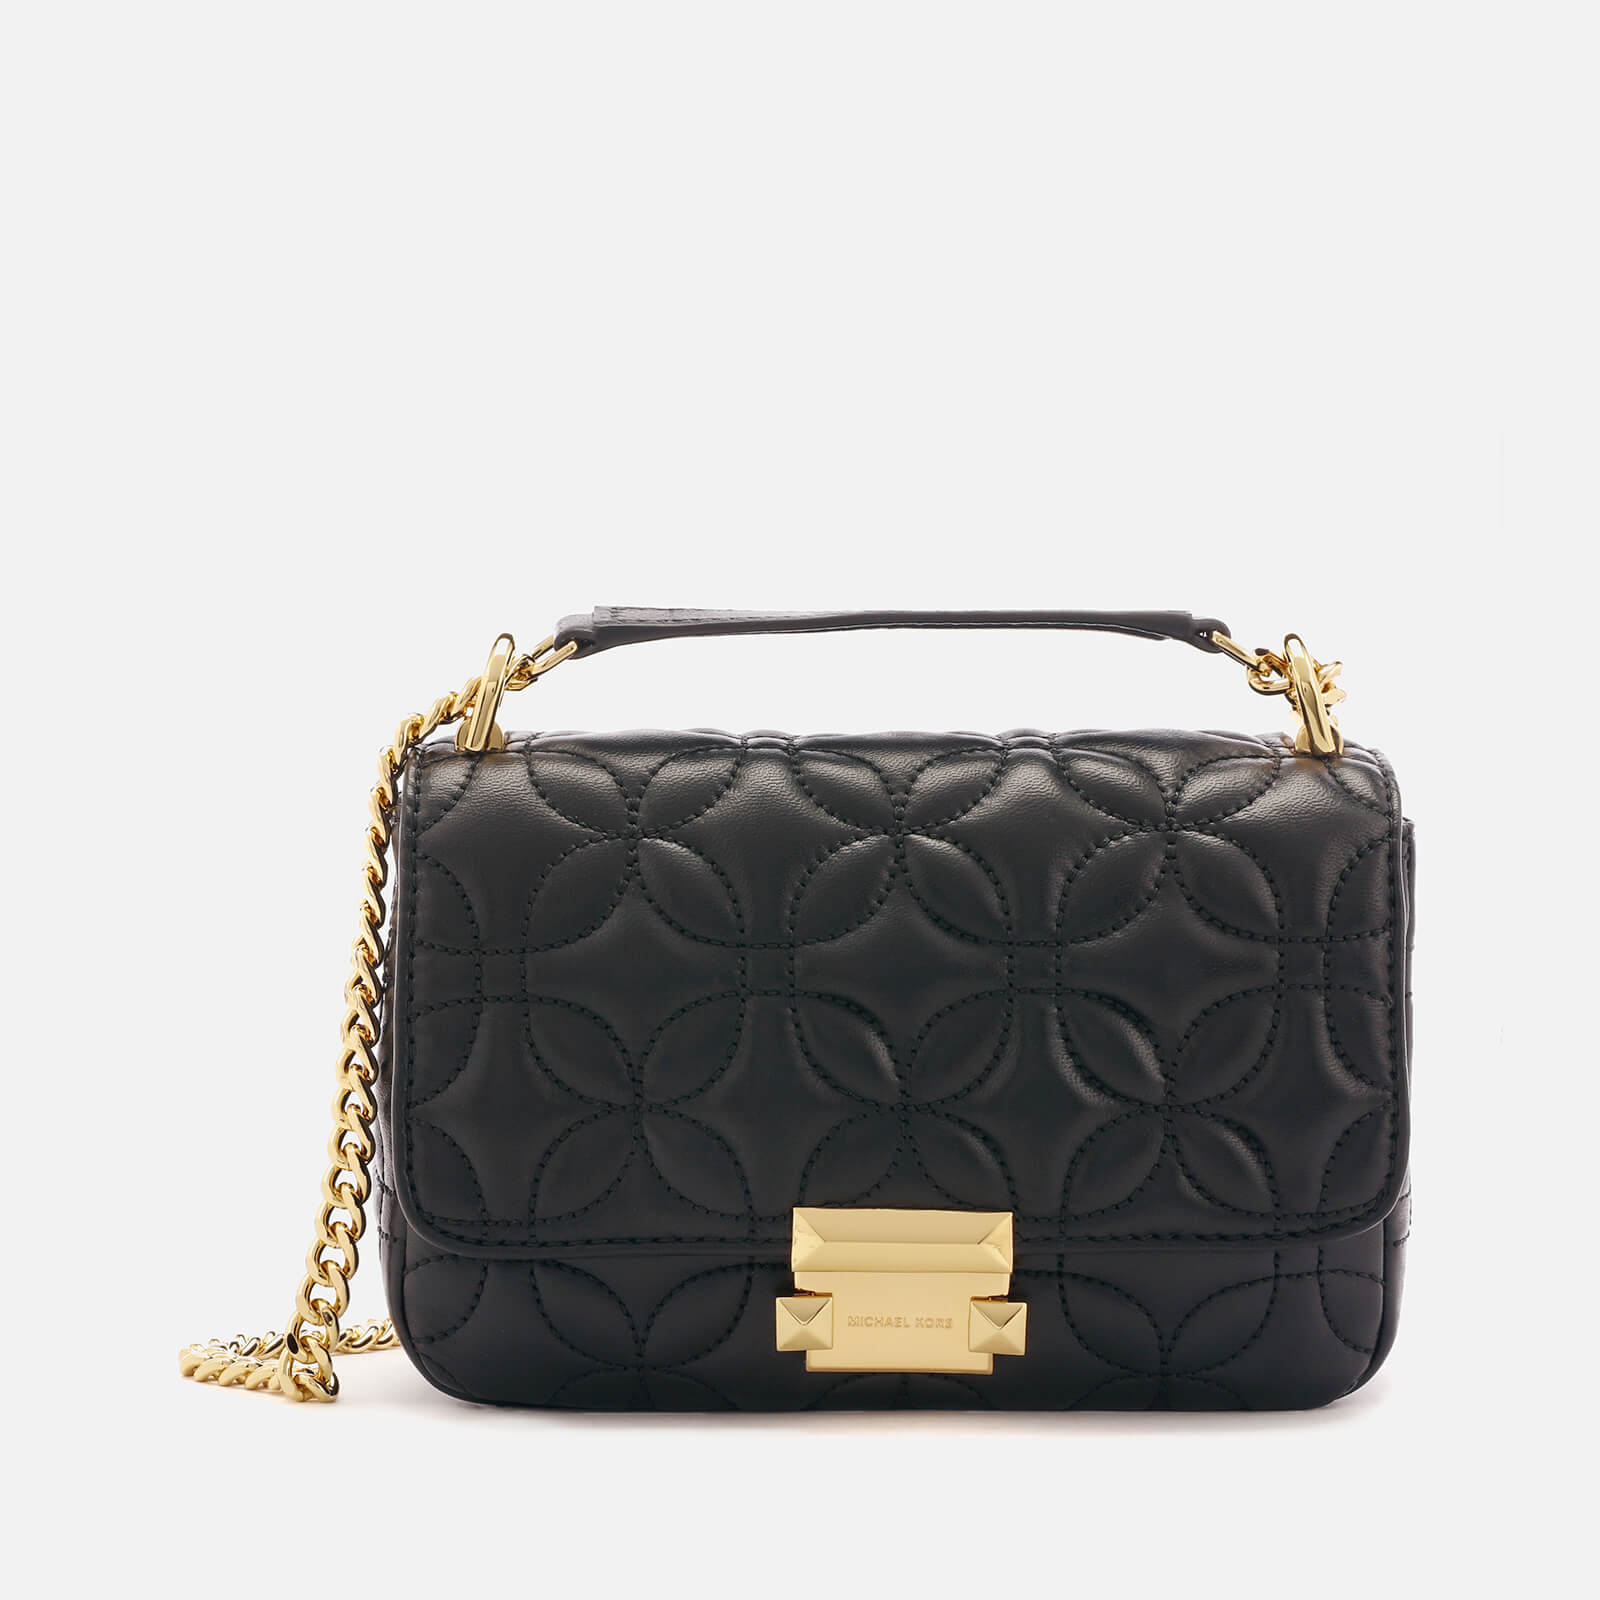 0aa44be8bd5 MICHAEL MICHAEL KORS Women s Sloan Chain Shoulder Bag - Black Flora Womens  Accessories